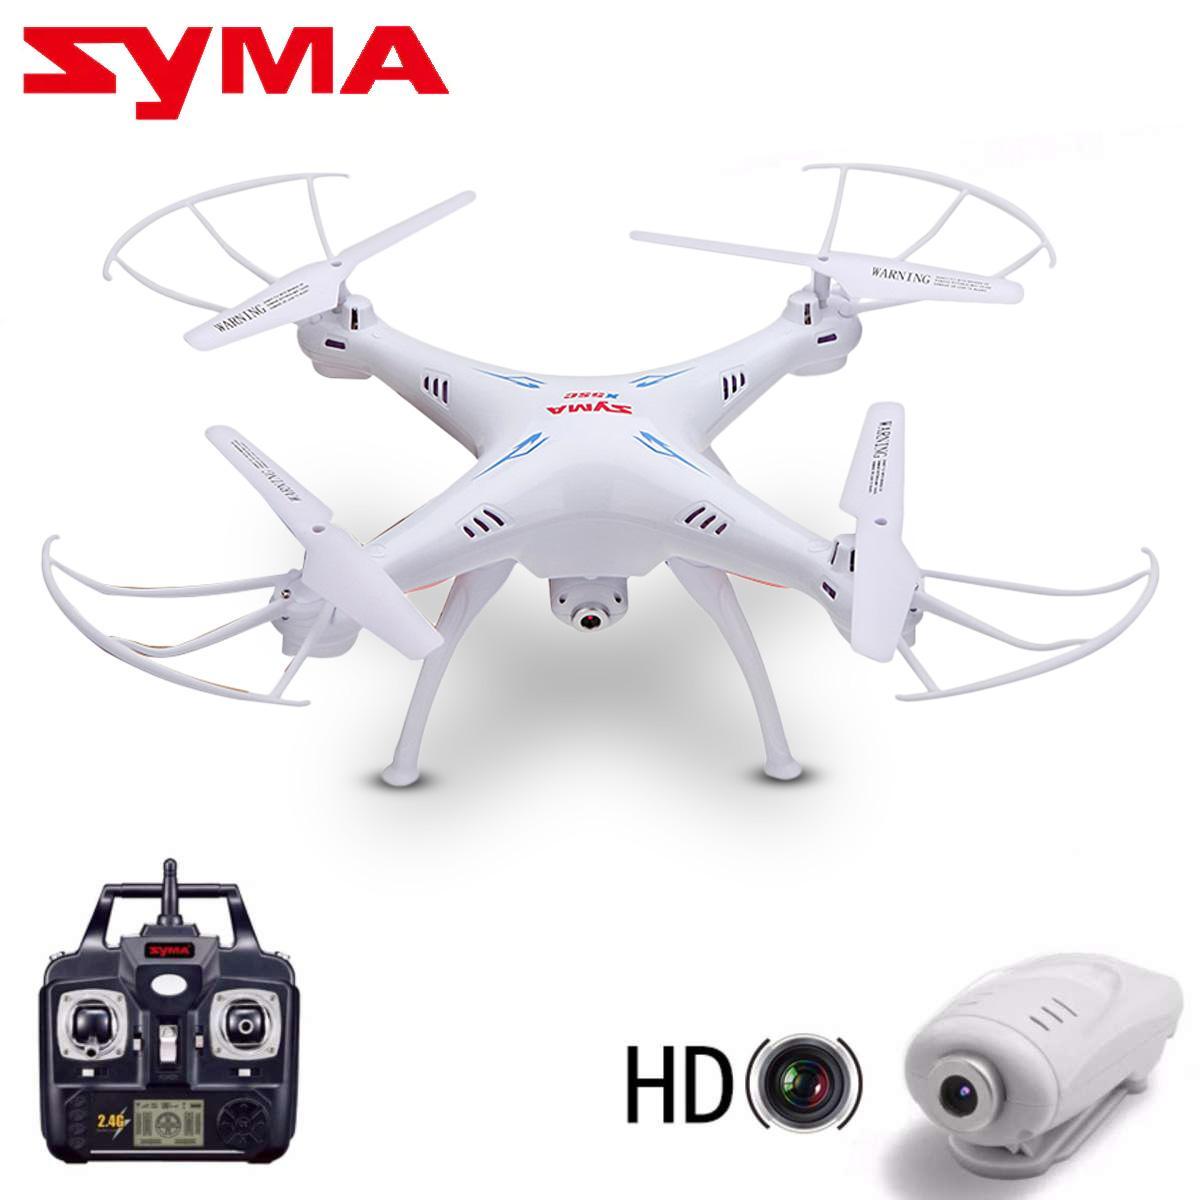 72833e0d542 Syma X5SC Explorers 4 Channel 2.4GHz R/C 6-Axis Gyro Quadcopter Drone